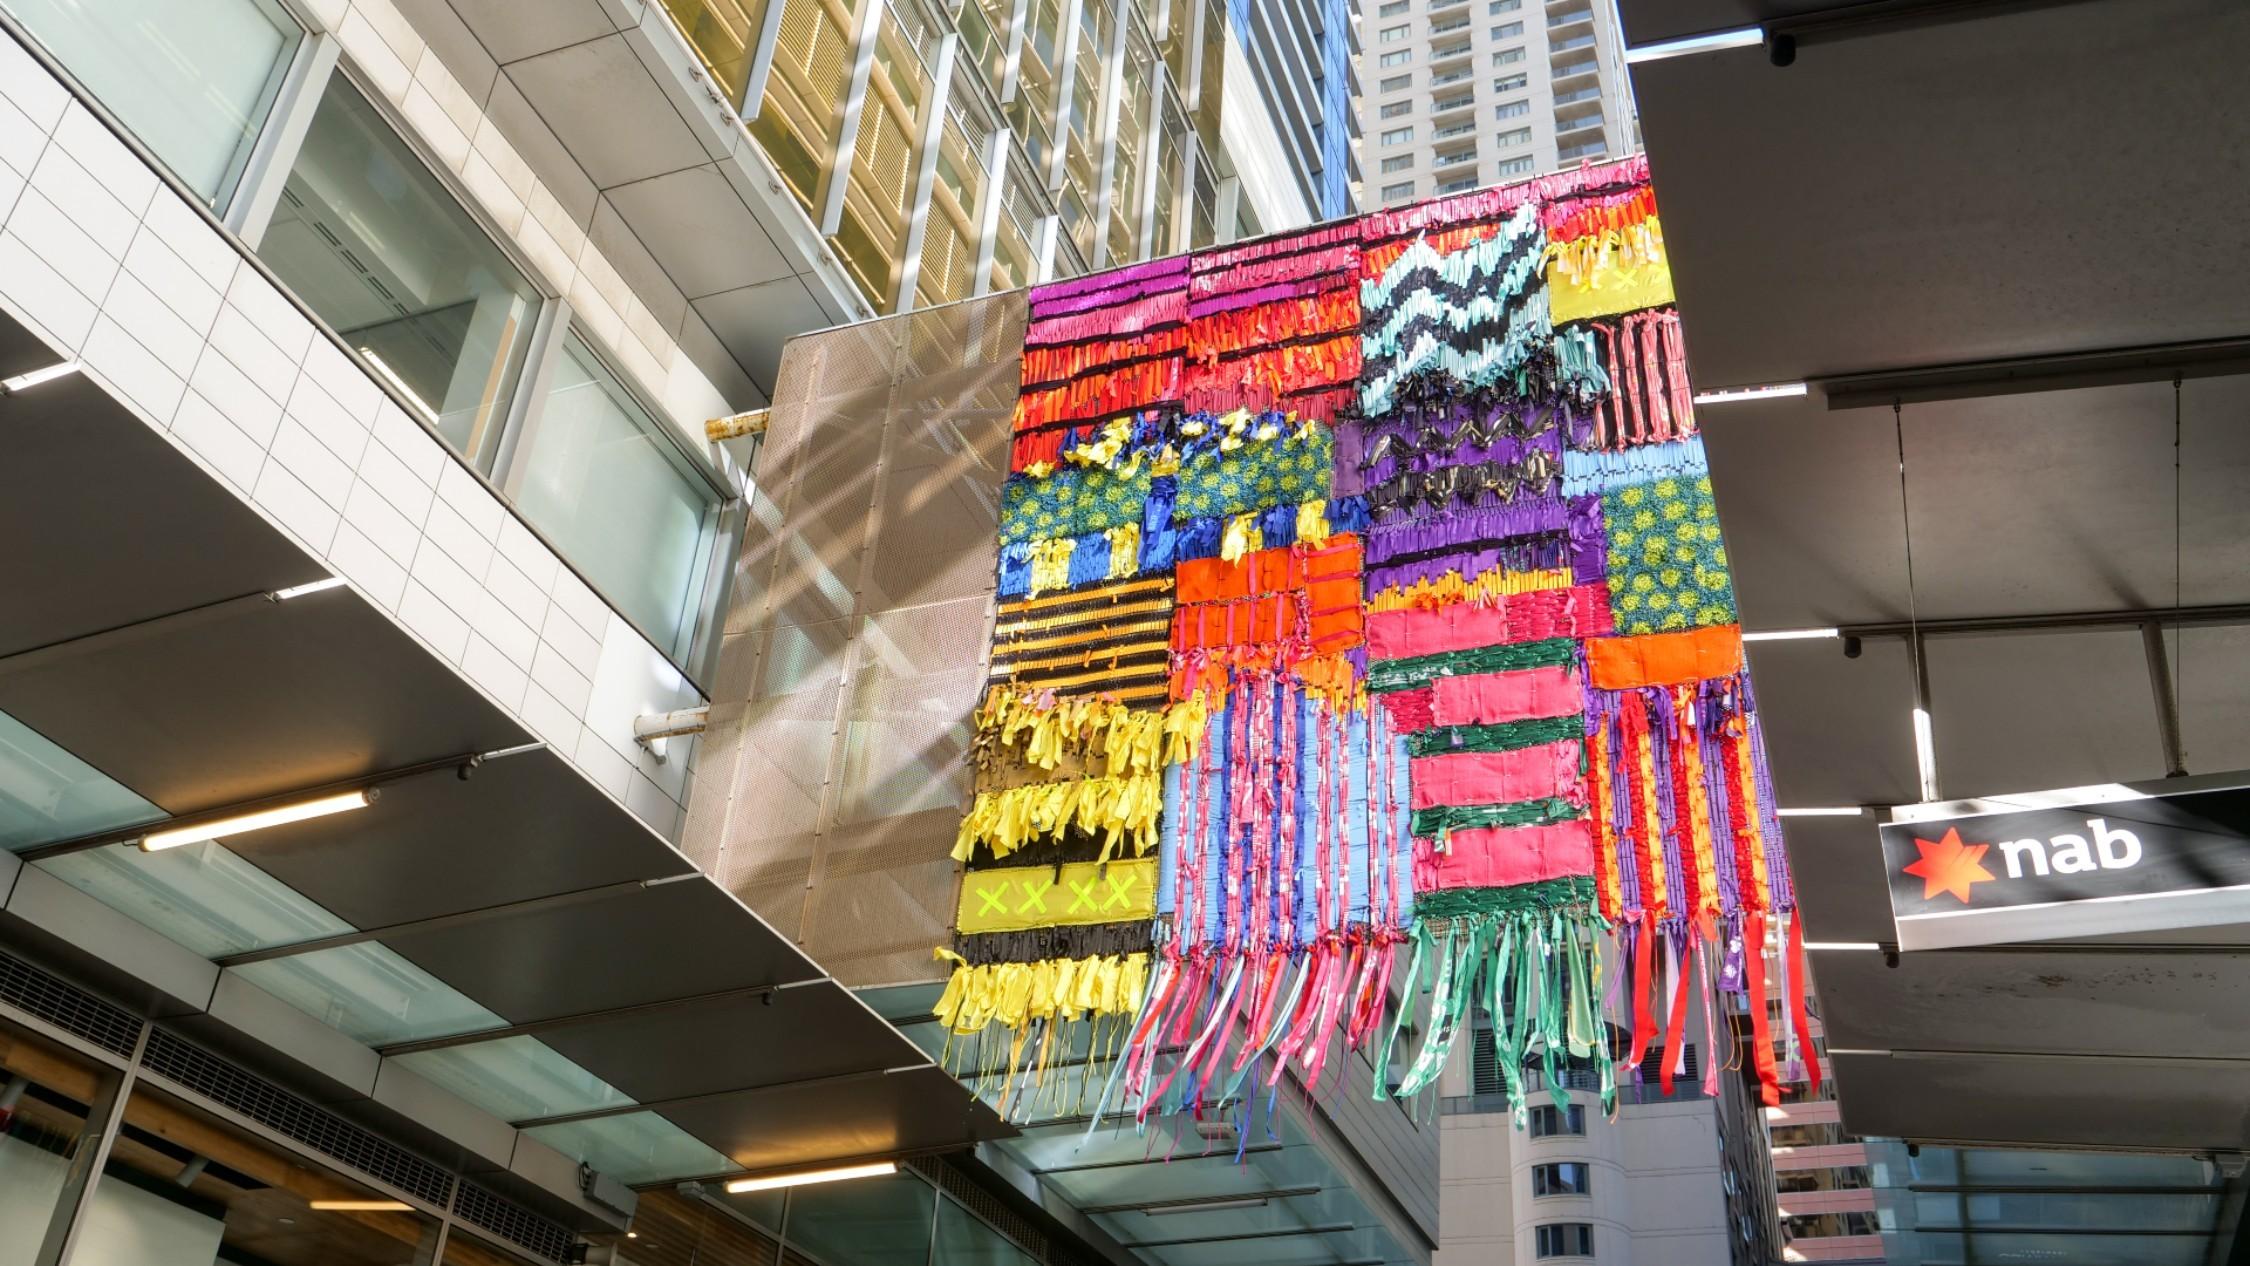 'Weaving Thru the World', at World Square